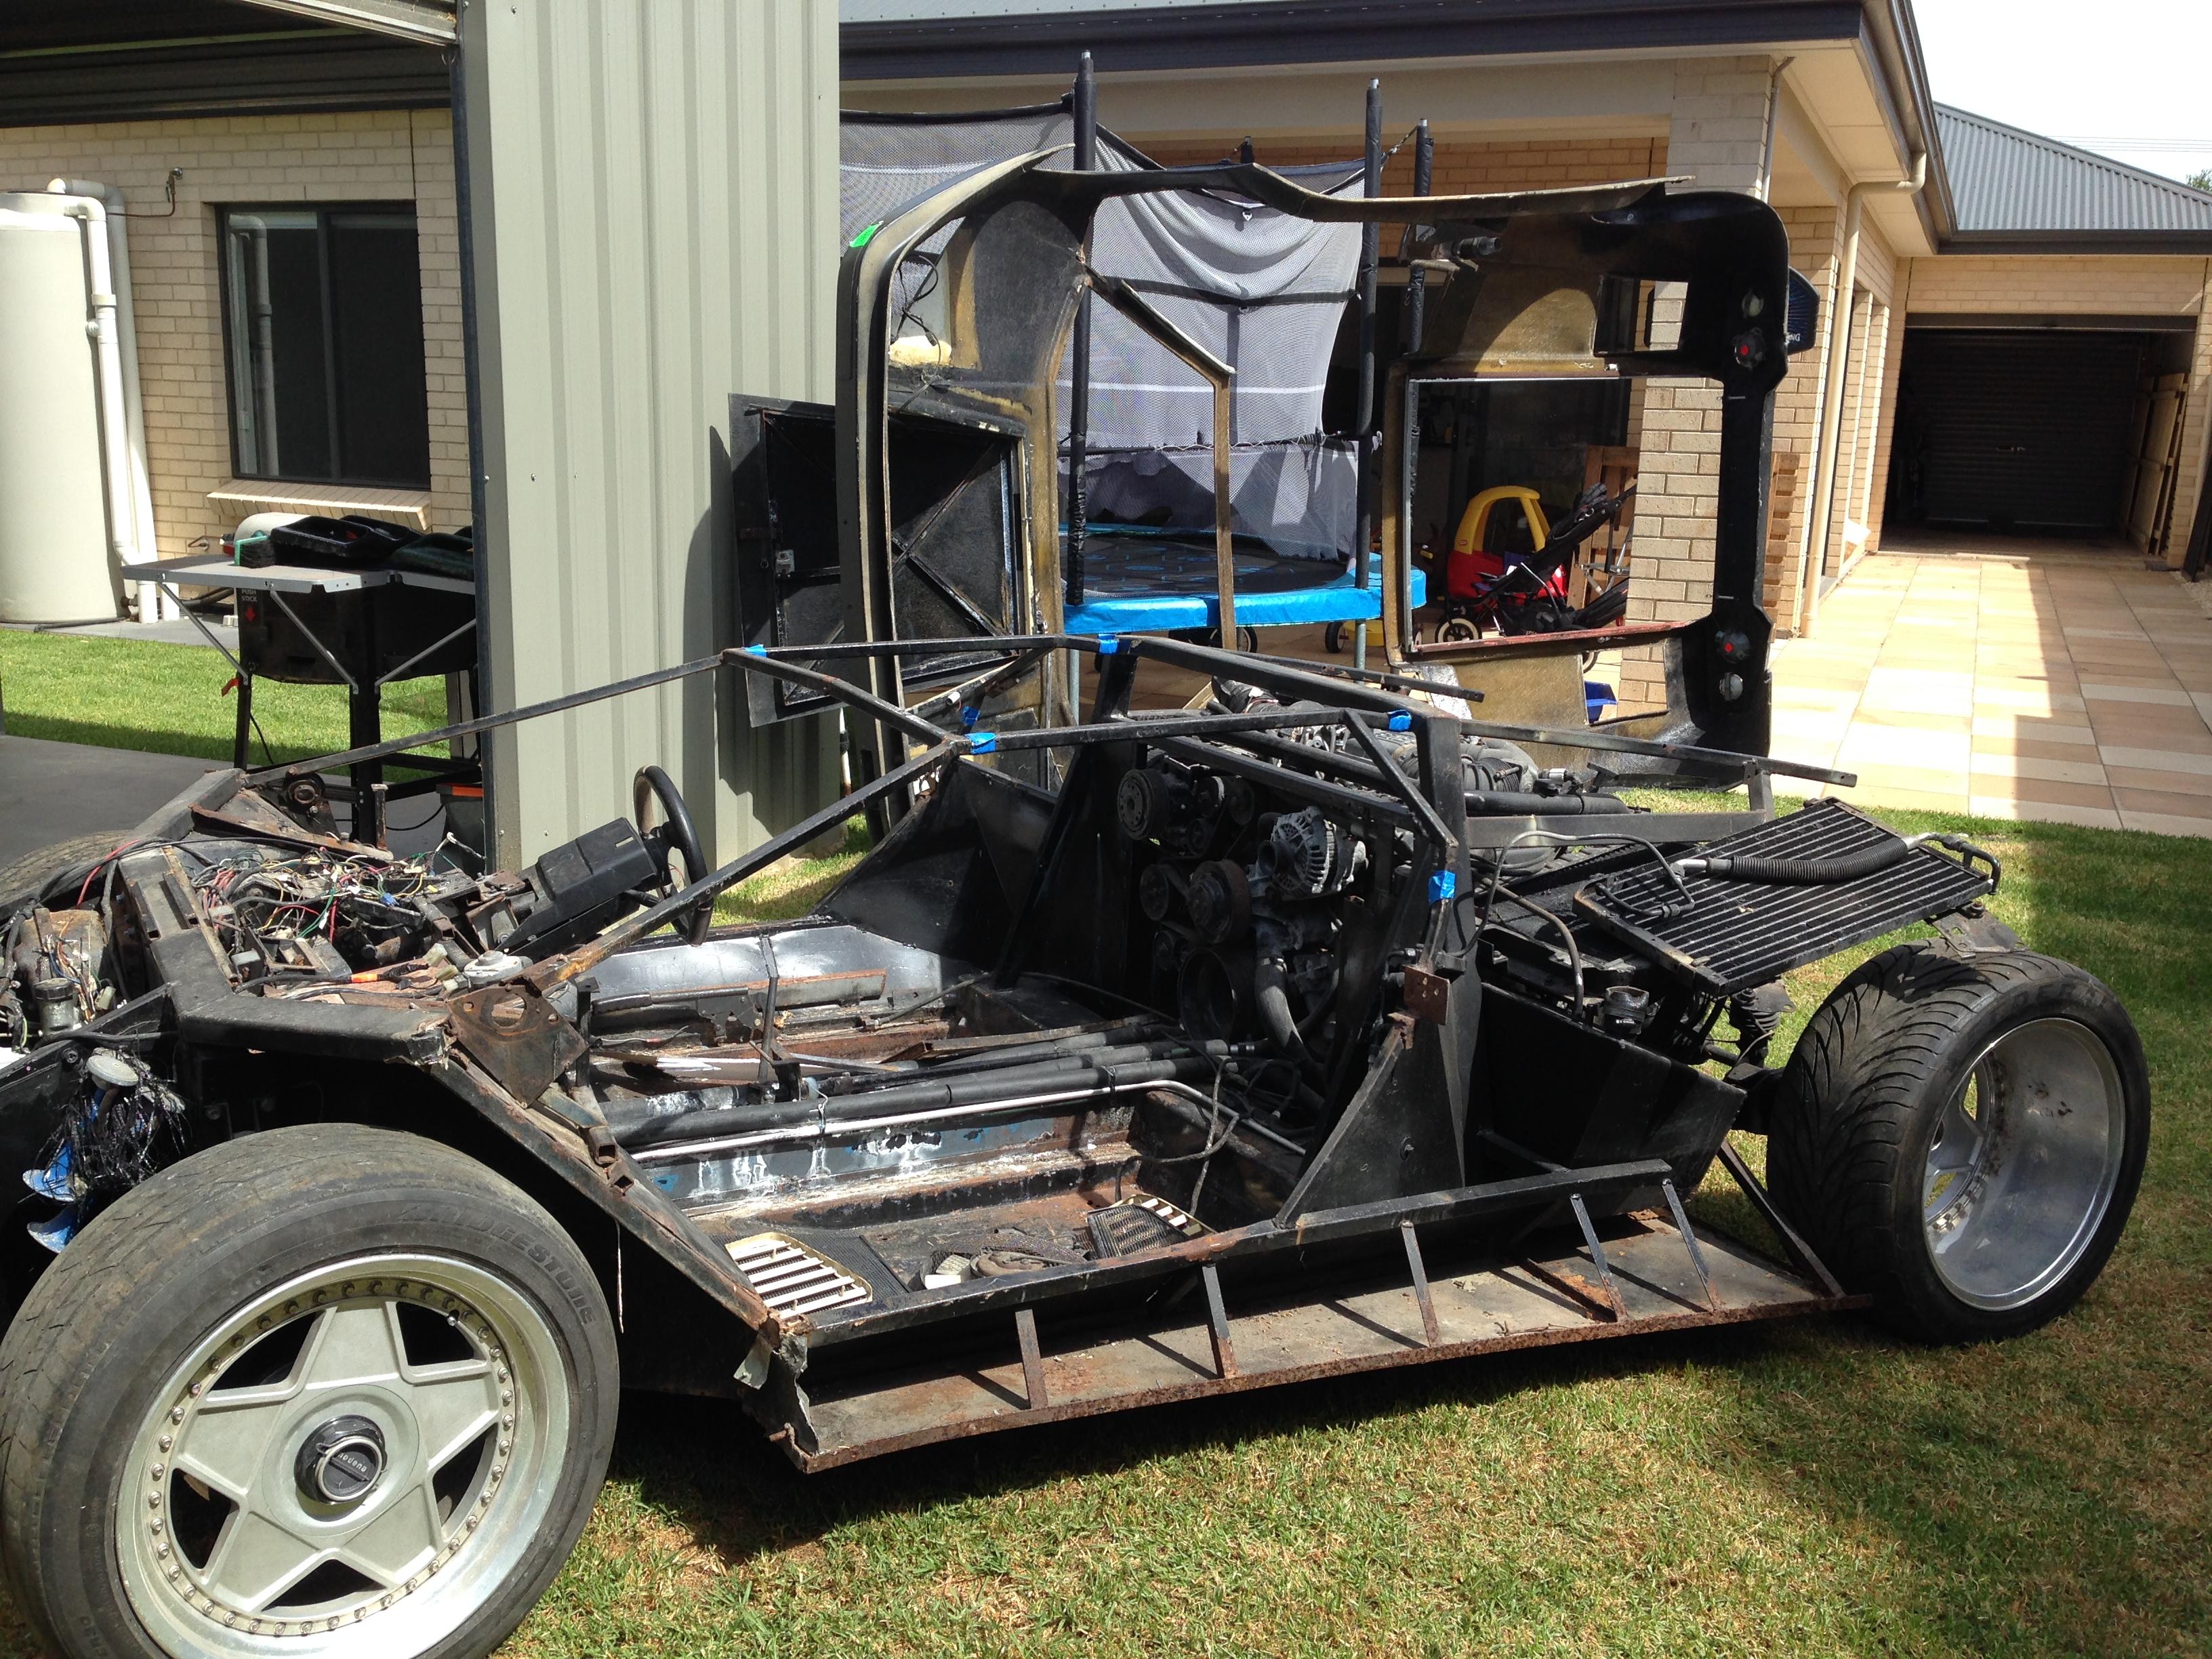 Kit car project underway | ultimatemancavebuild